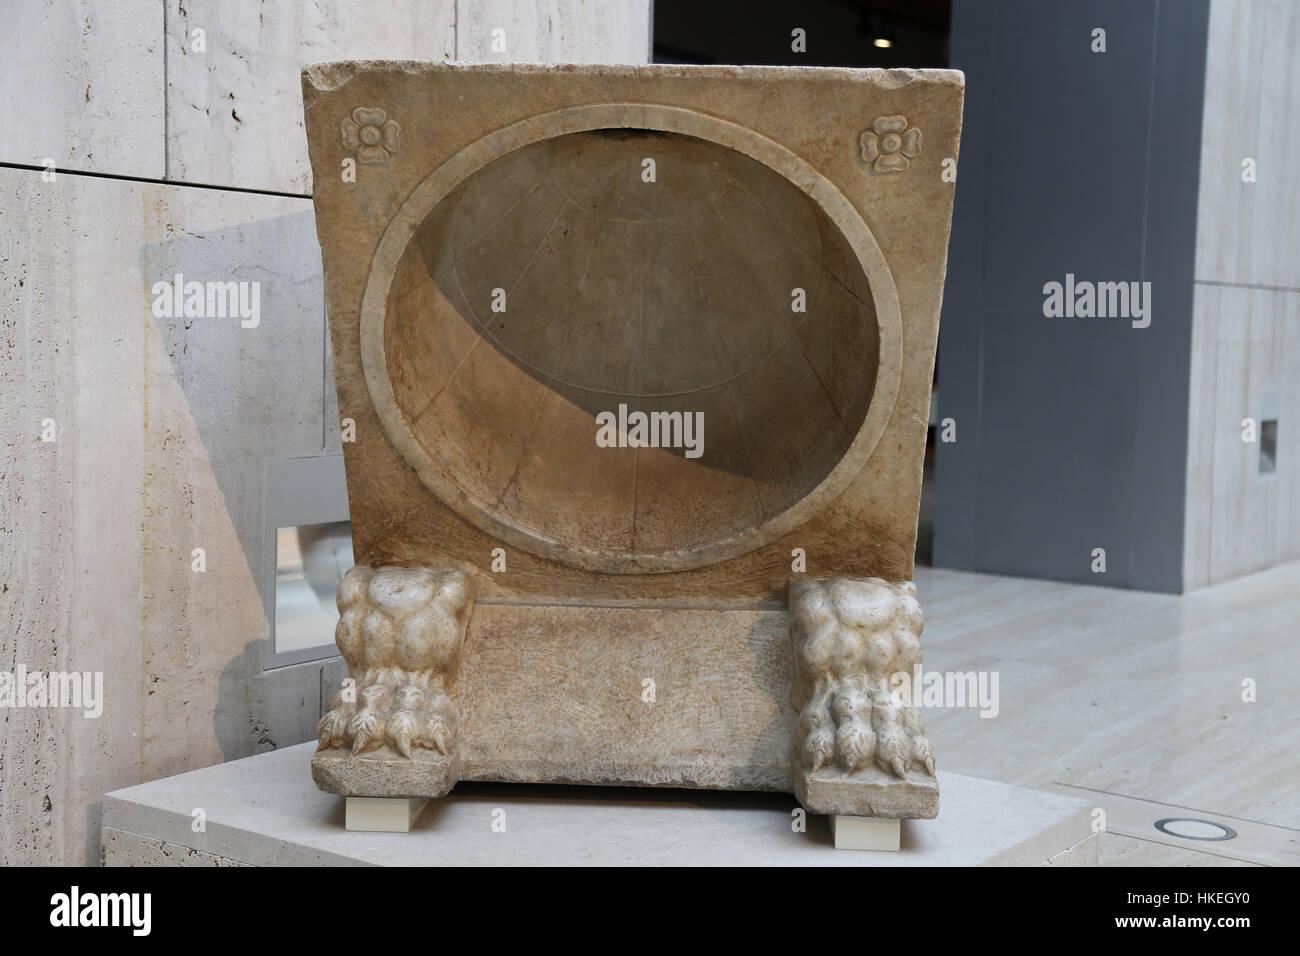 Meridiana. Il marmo. 1 ° secolo. Baelo Claudia (Bolonia Cadice). Spagna. Immagini Stock